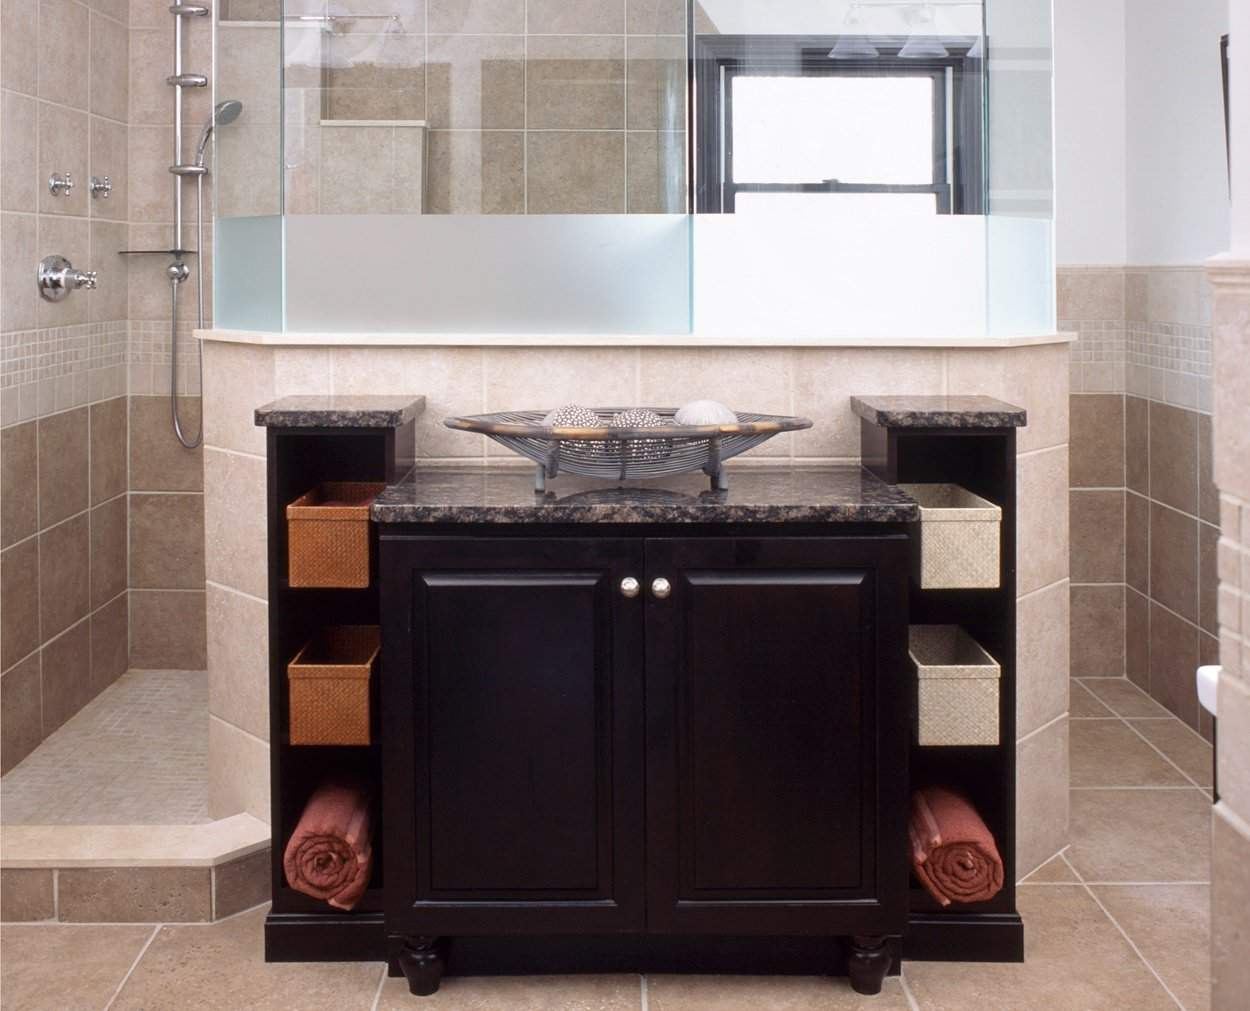 K-bath2 1250x1011-2